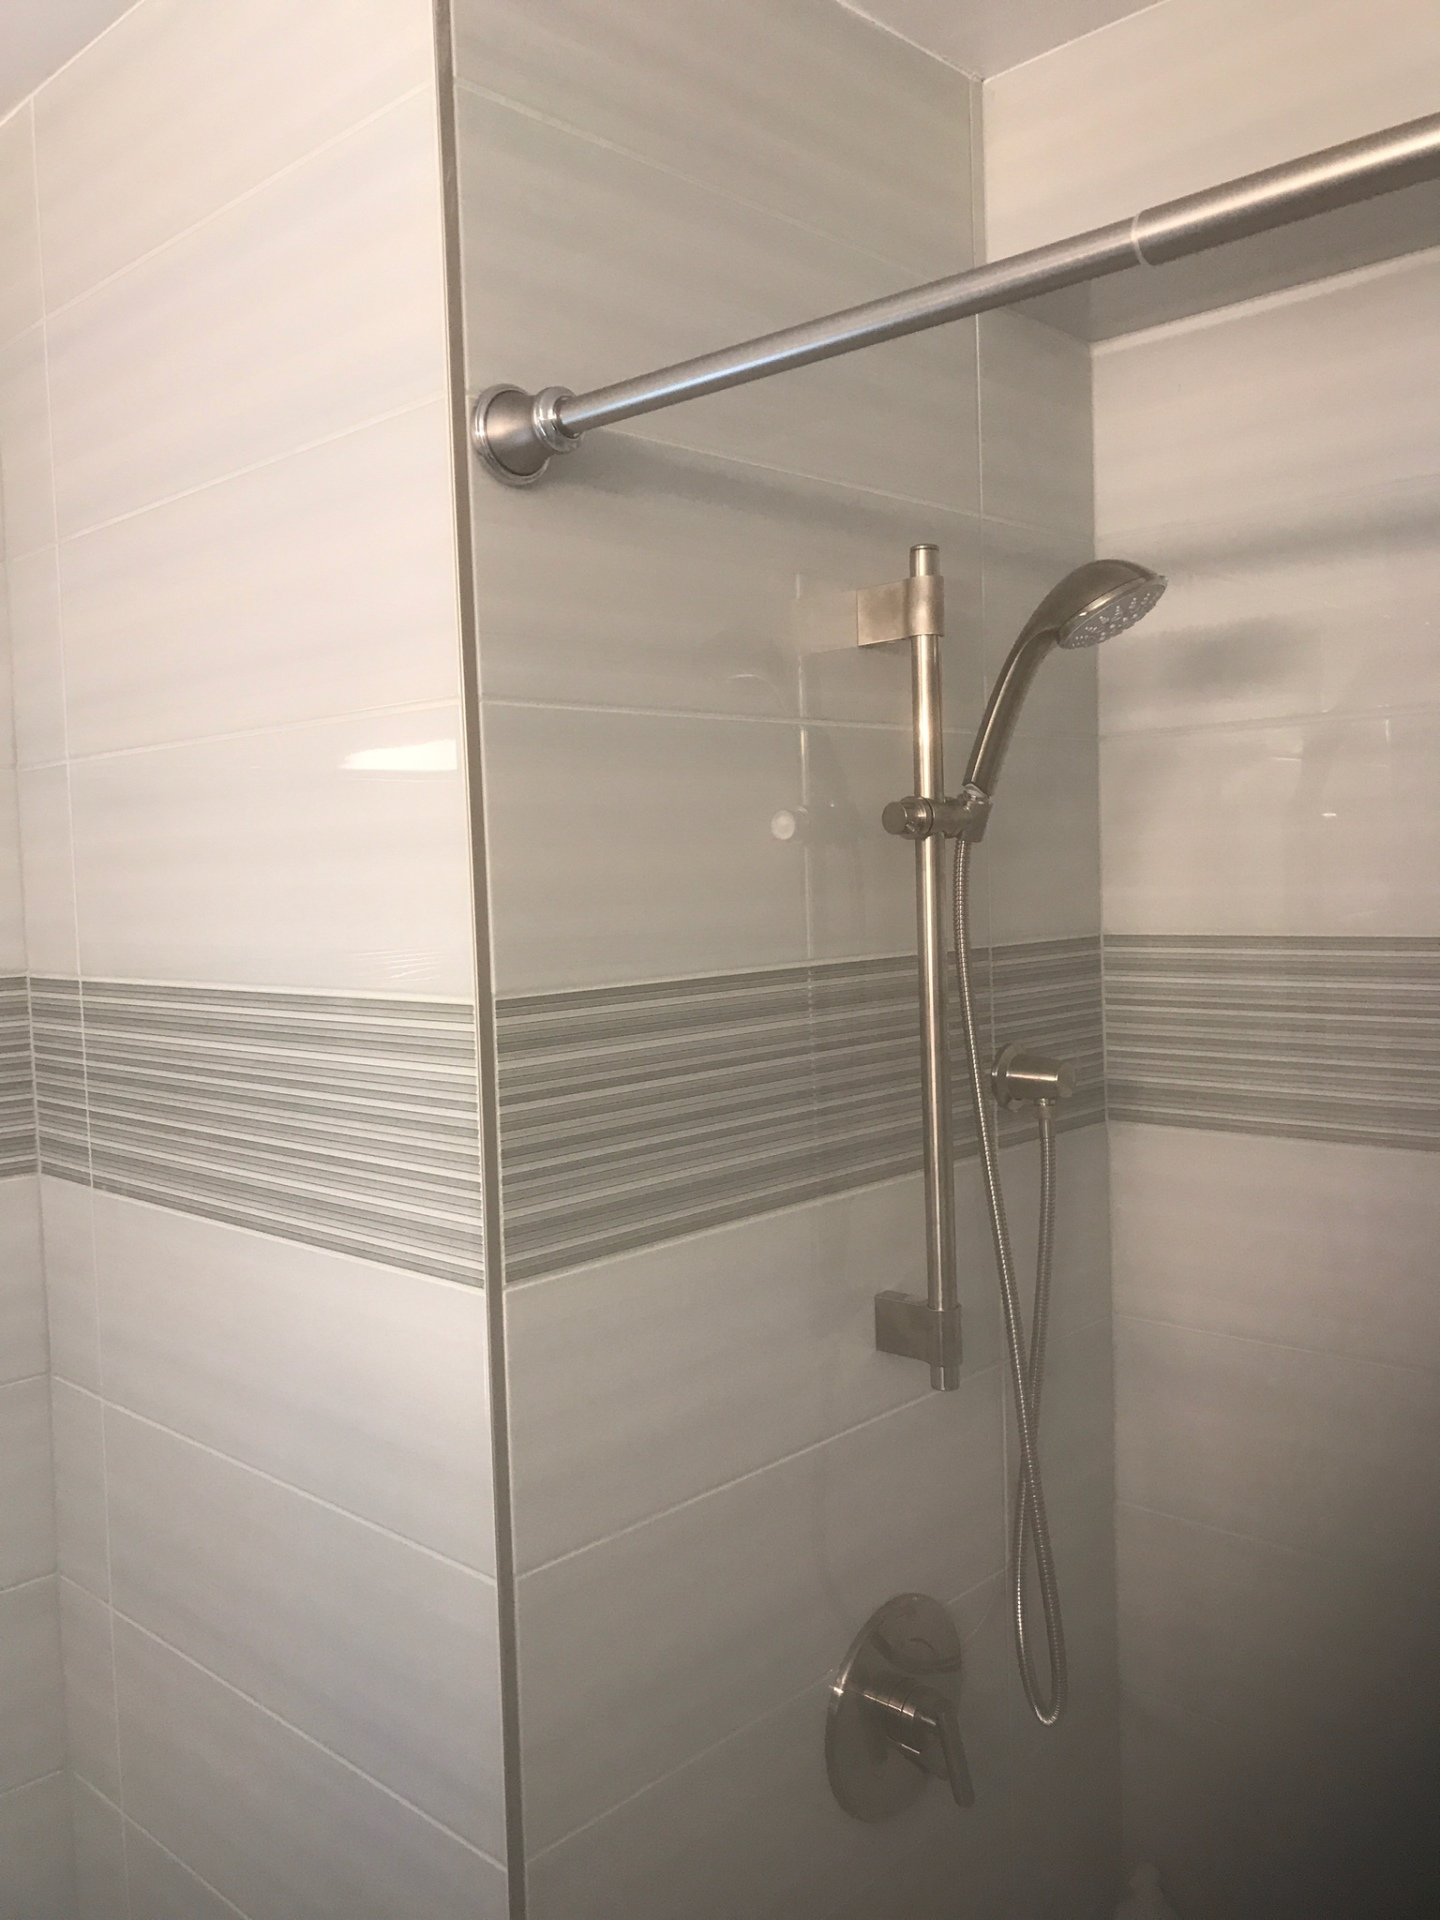 bathroom renovation, bathroom remodeling, replaced bathtub, replaced tiles